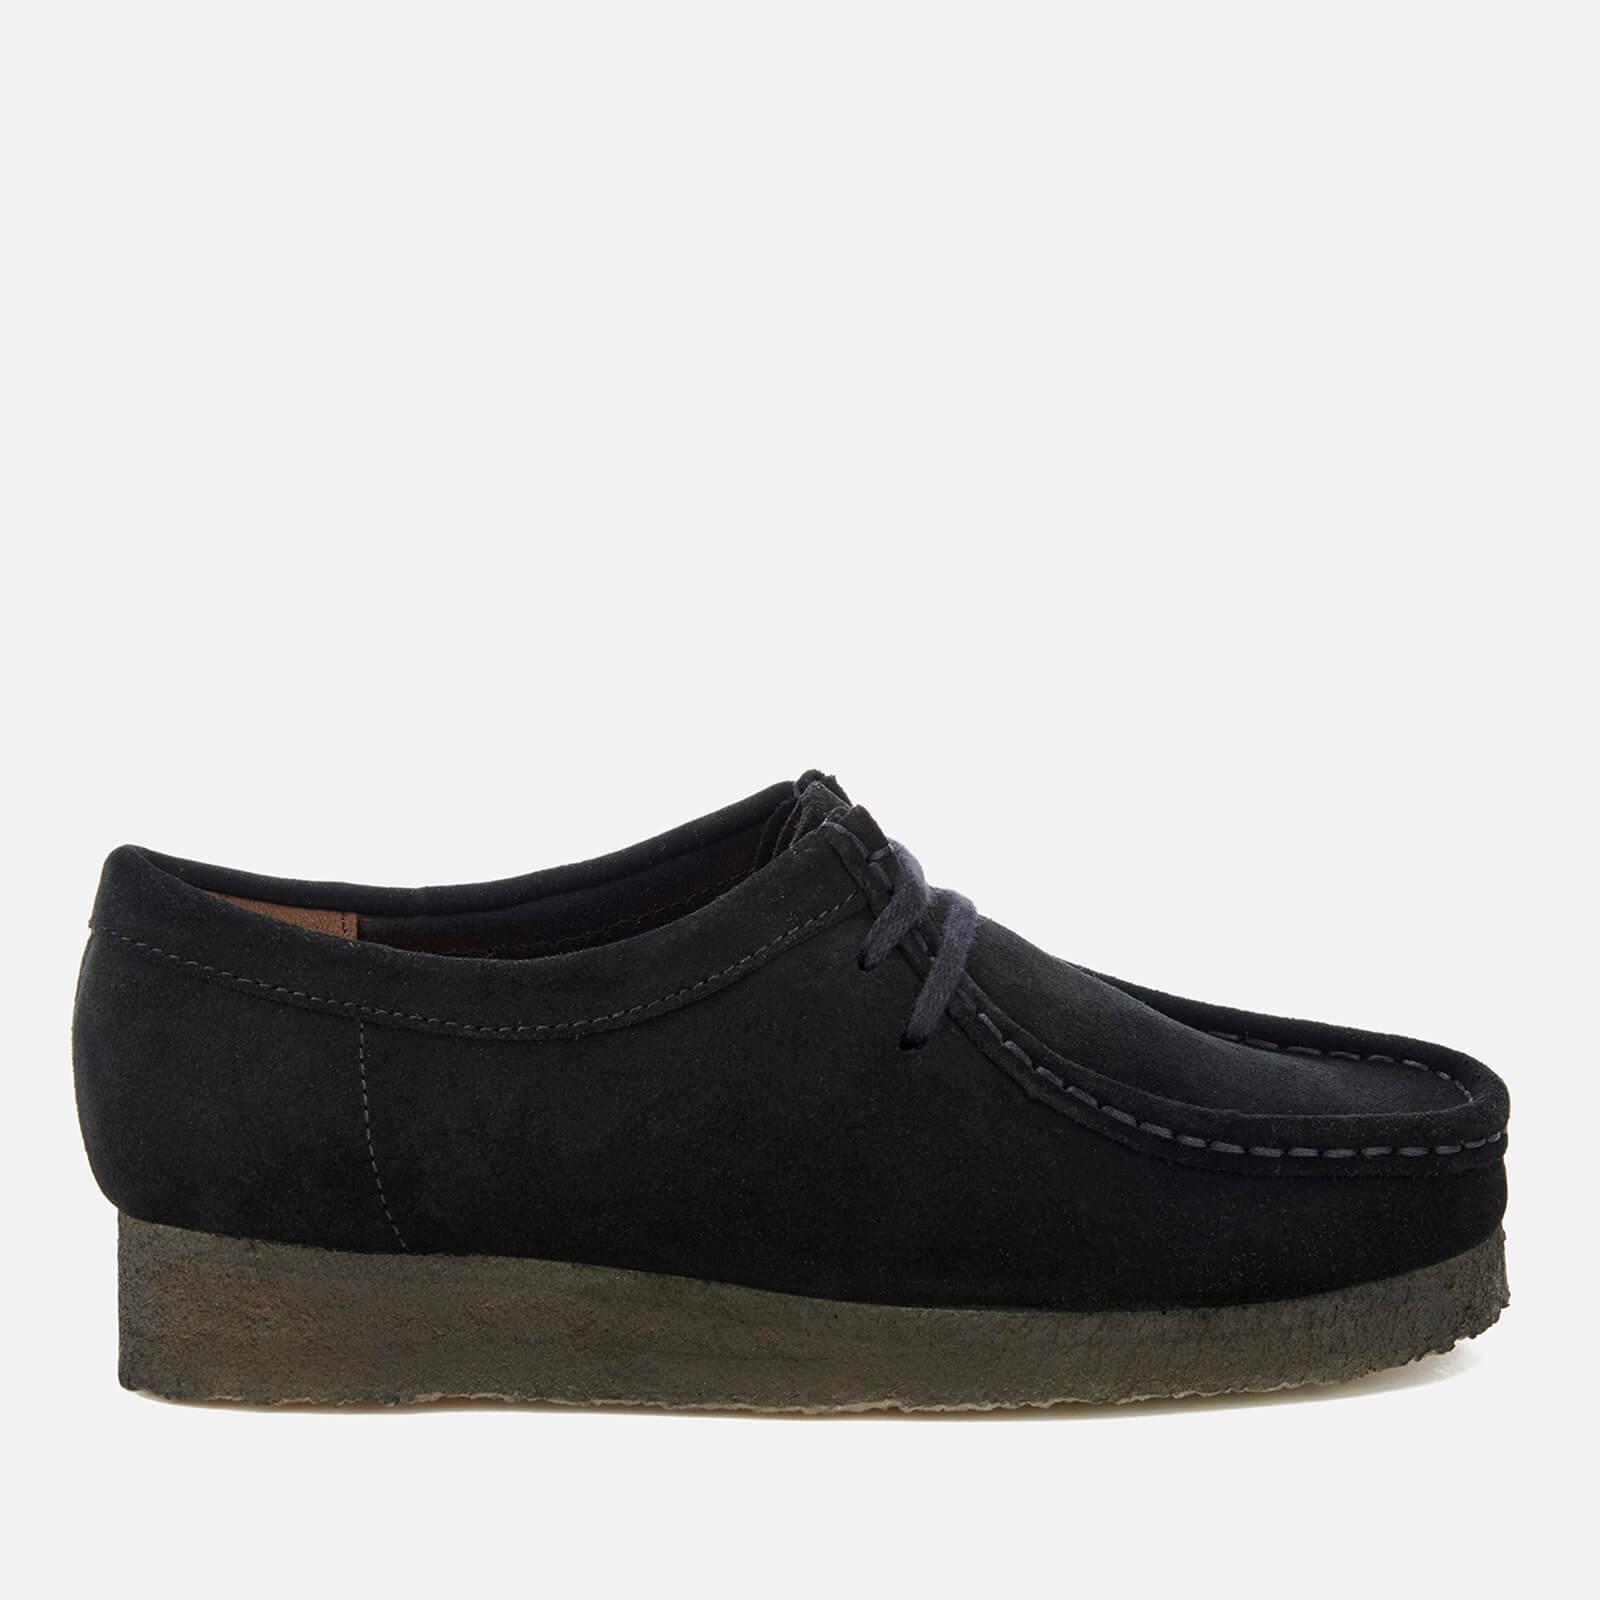 the latest ea408 f67f2 Clarks Originals Women's Wallabee Shoes - Black Suede